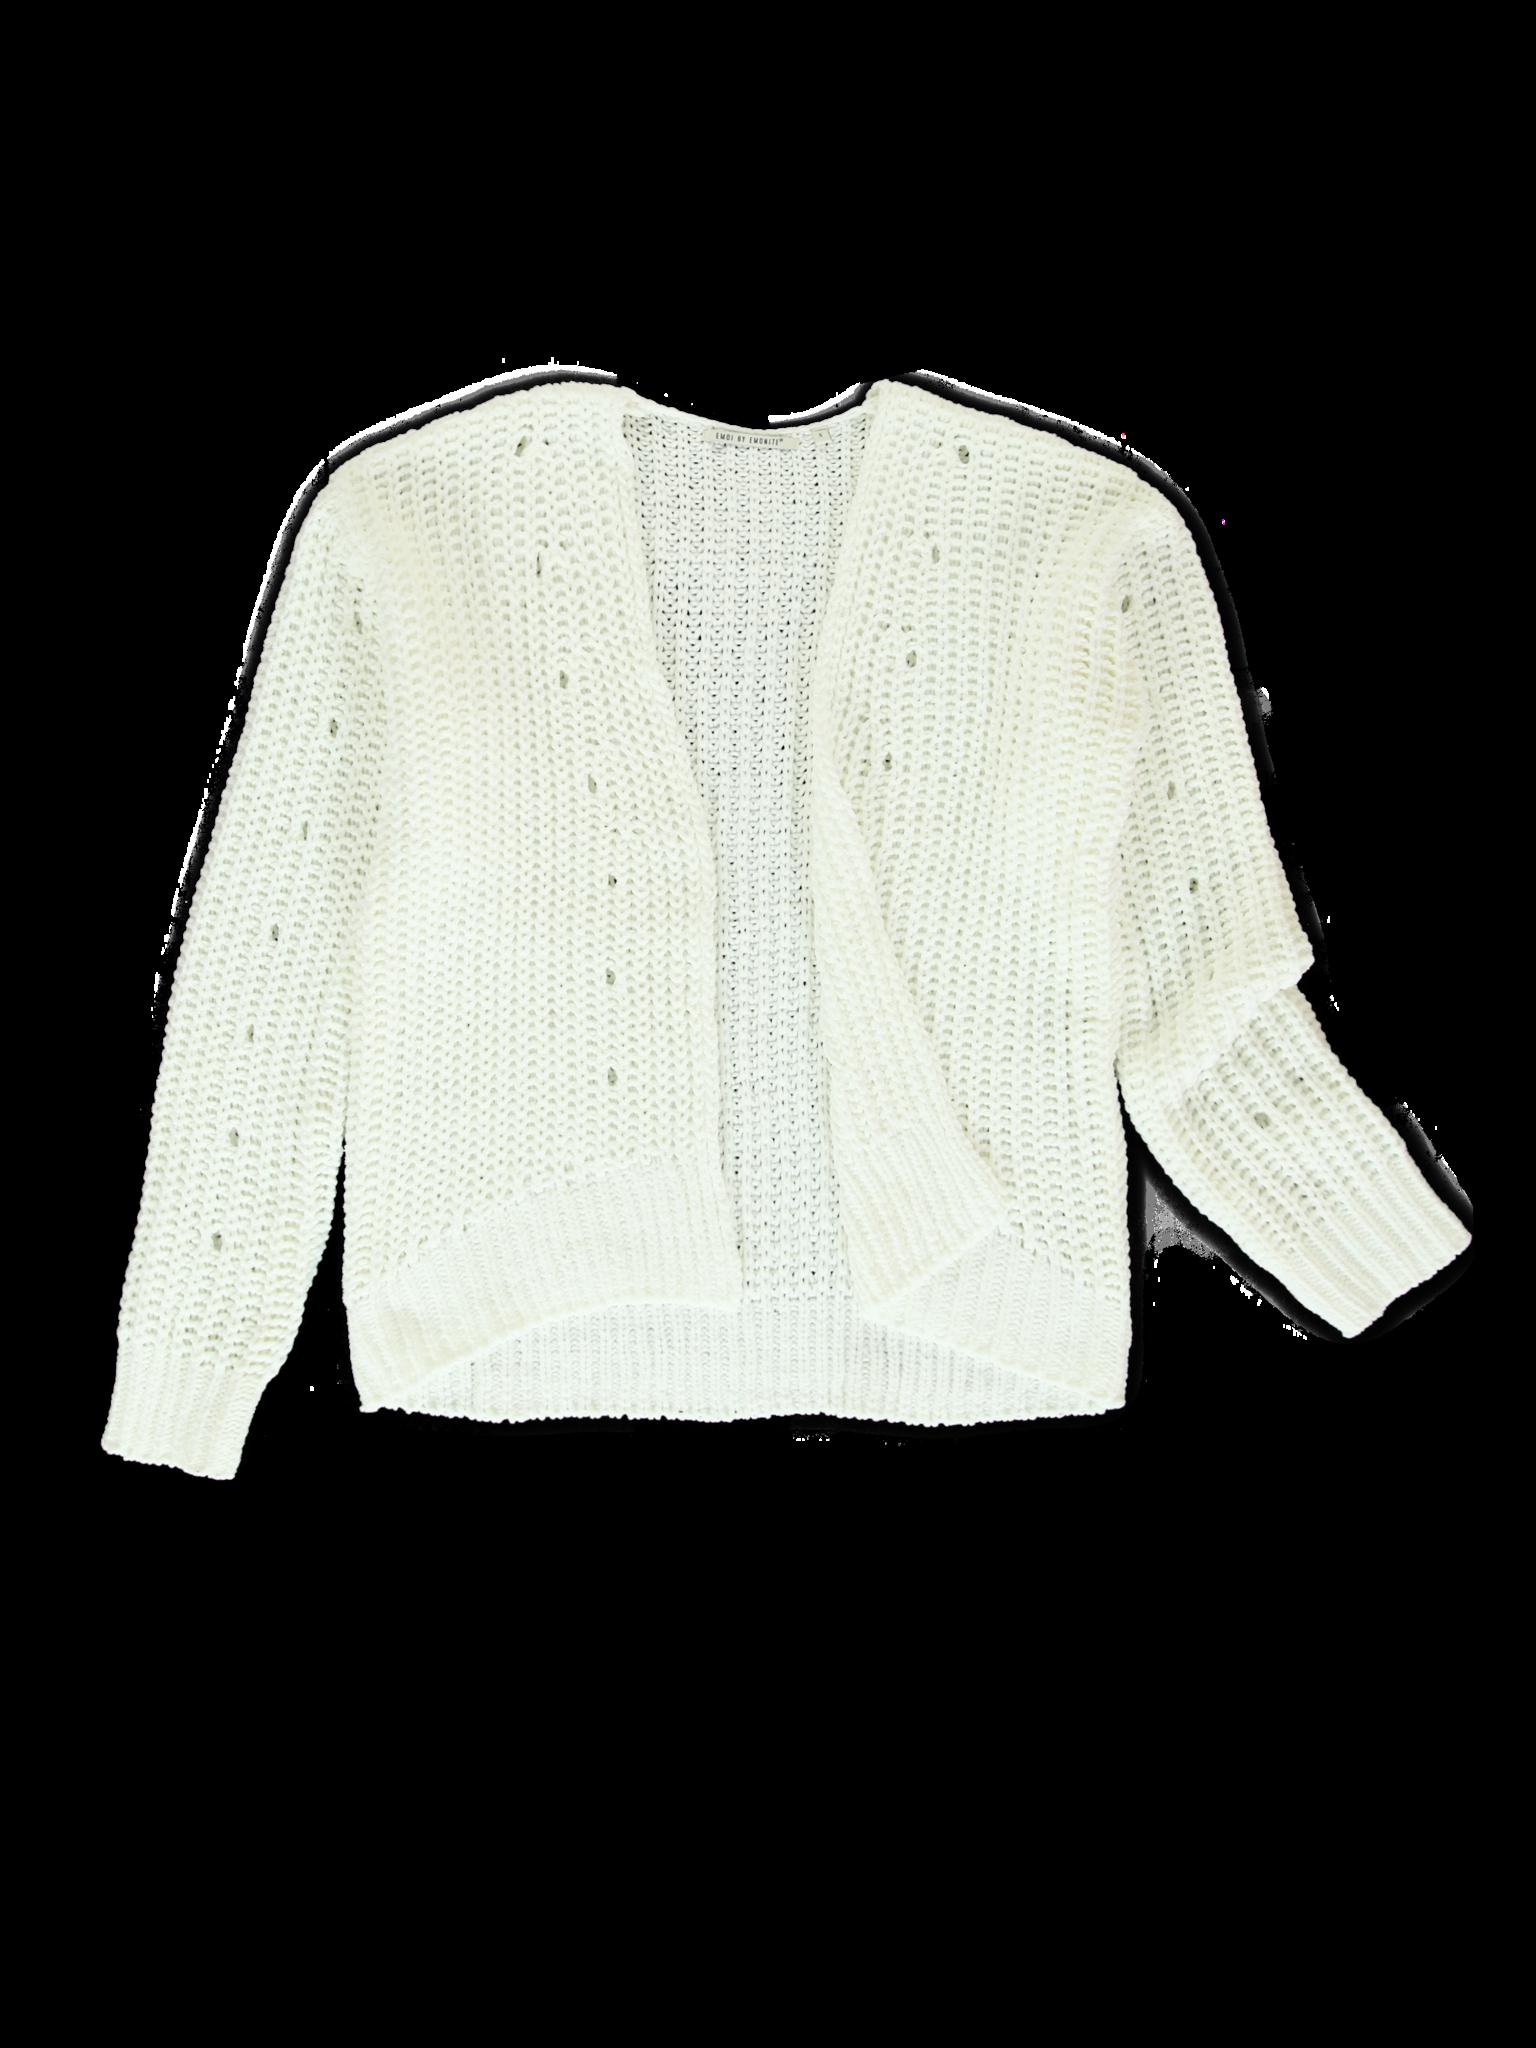 Emoi | Winter 2019 Ladies | Cardigan Knitwear | 24 pcs/box